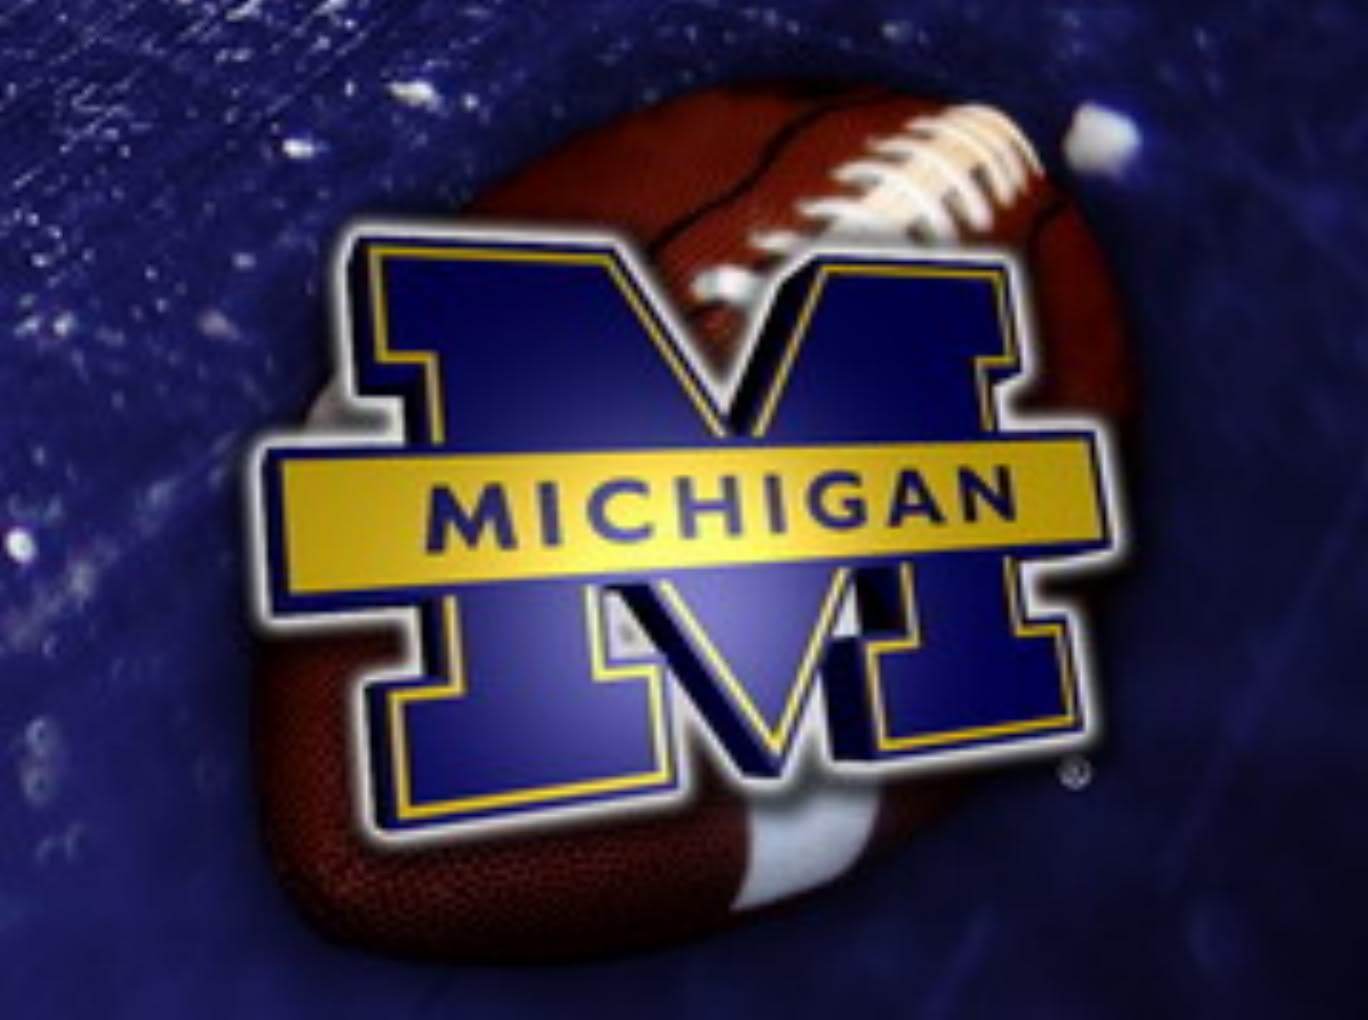 Michigan Football Wallpaper 1368x1020